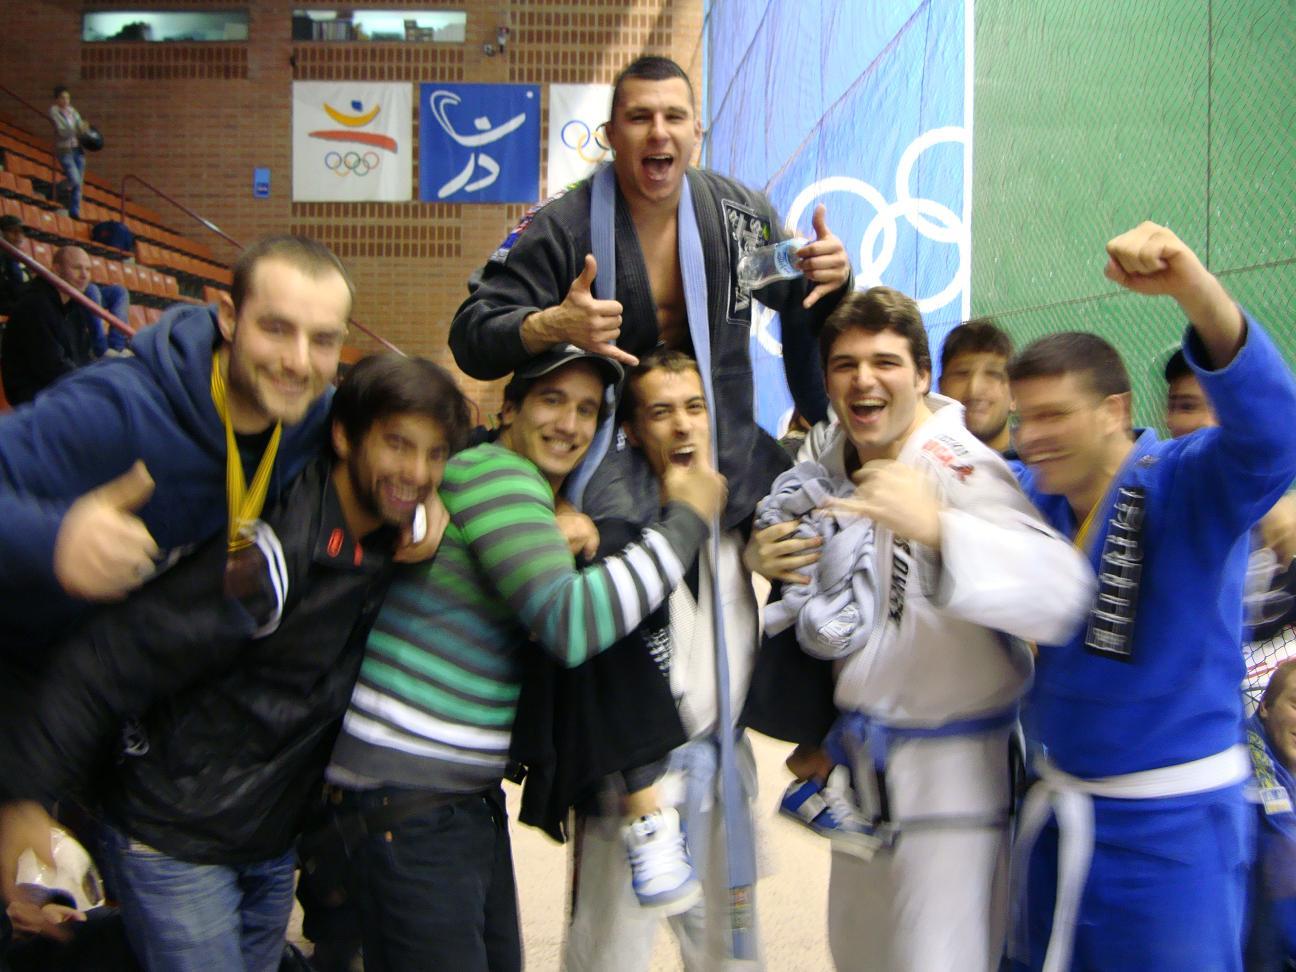 Parte del equipo Aranha BJJ celebrando la victoria de David